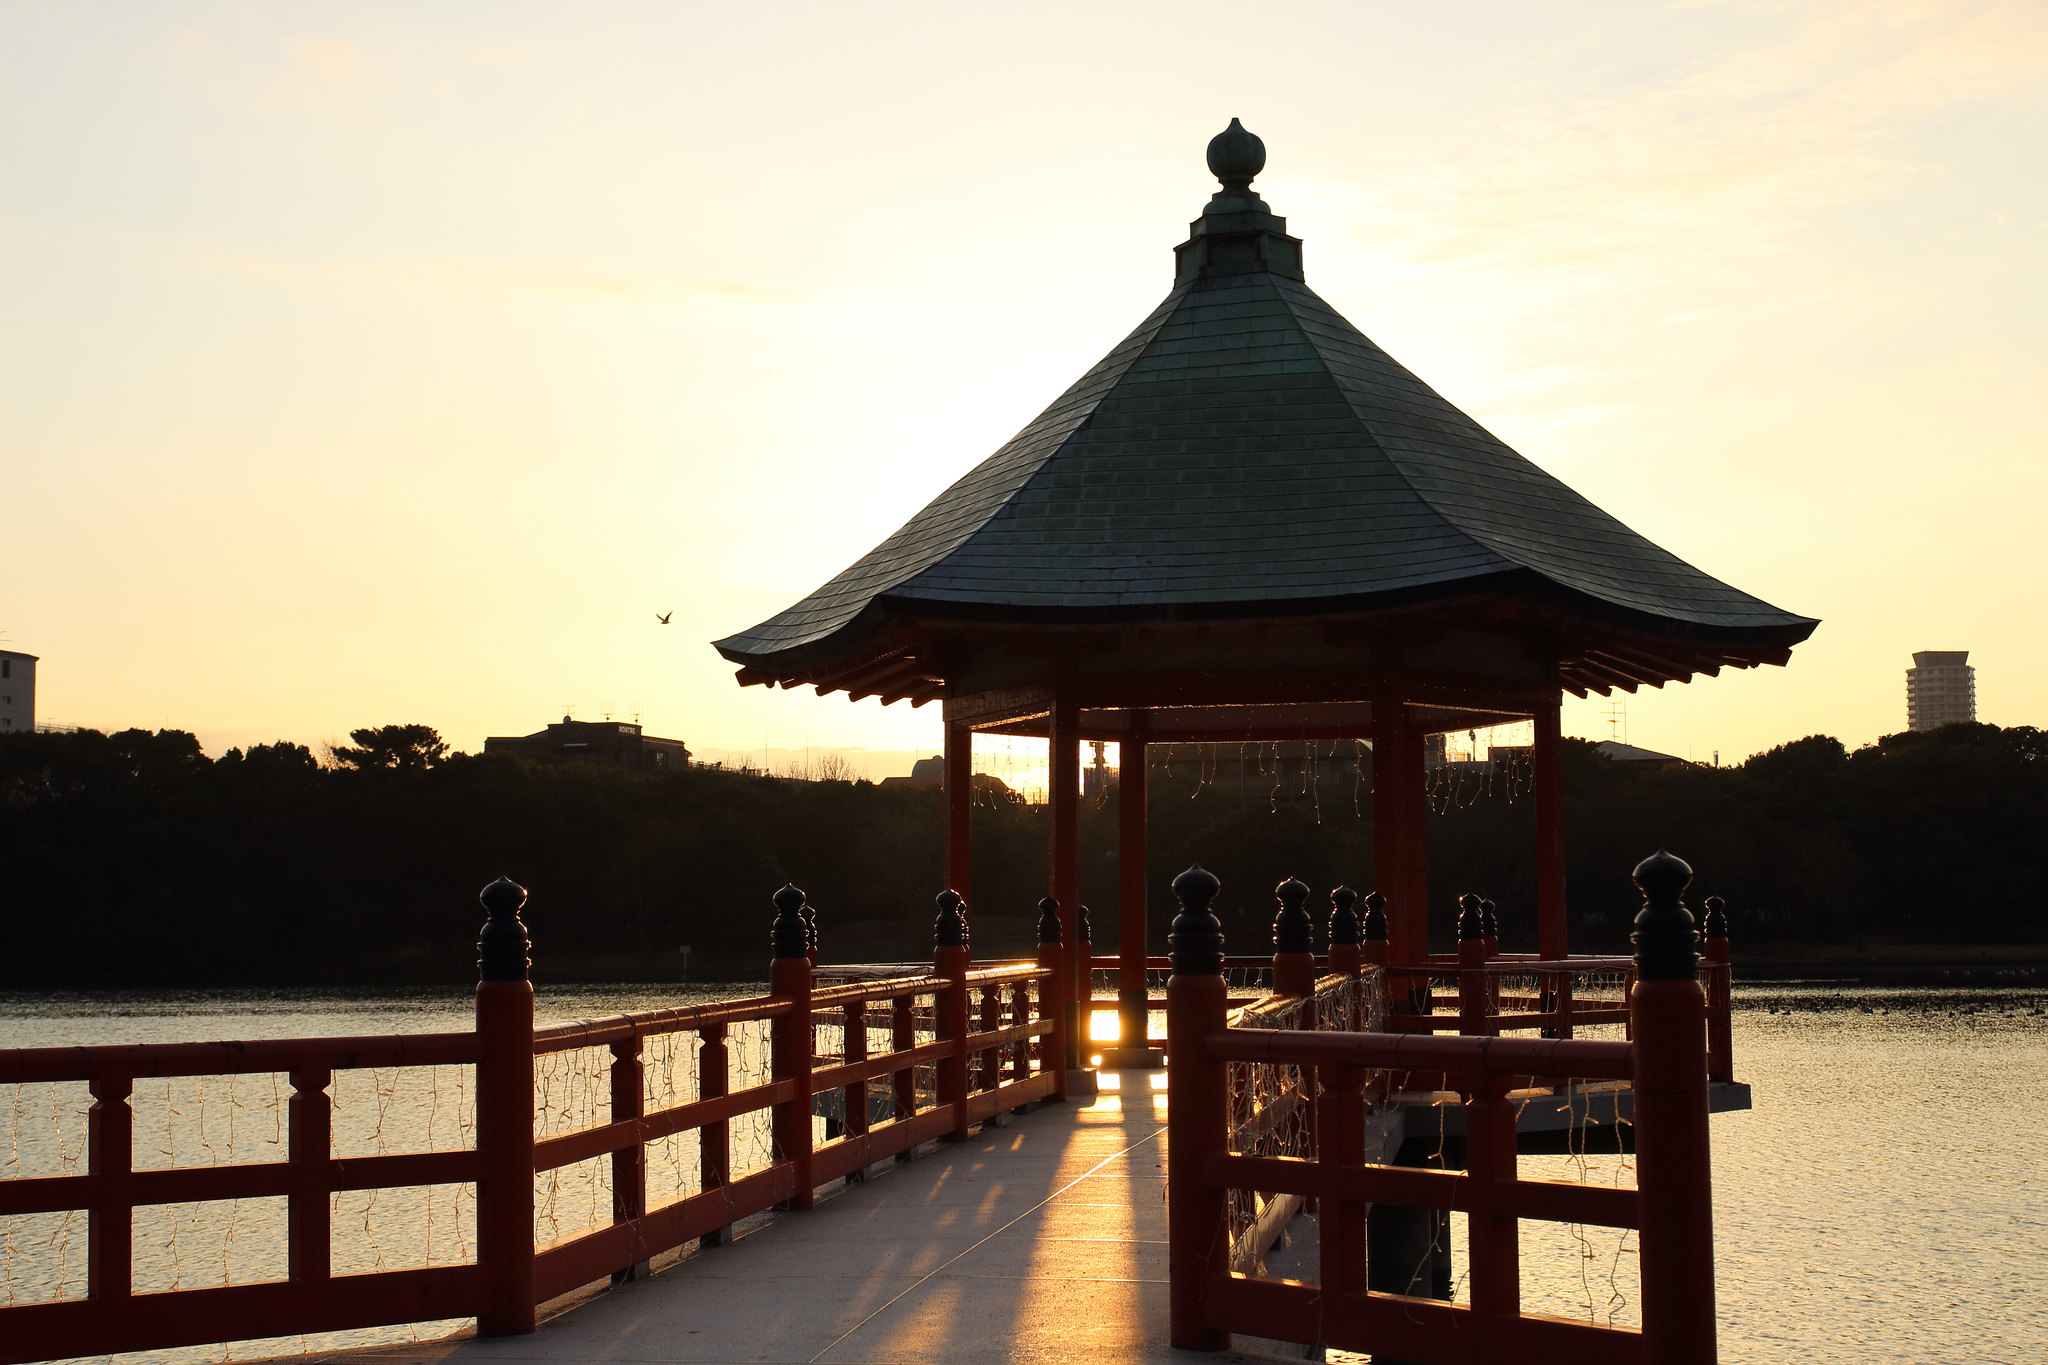 10 Things to do in Fukuoka, Japan 7